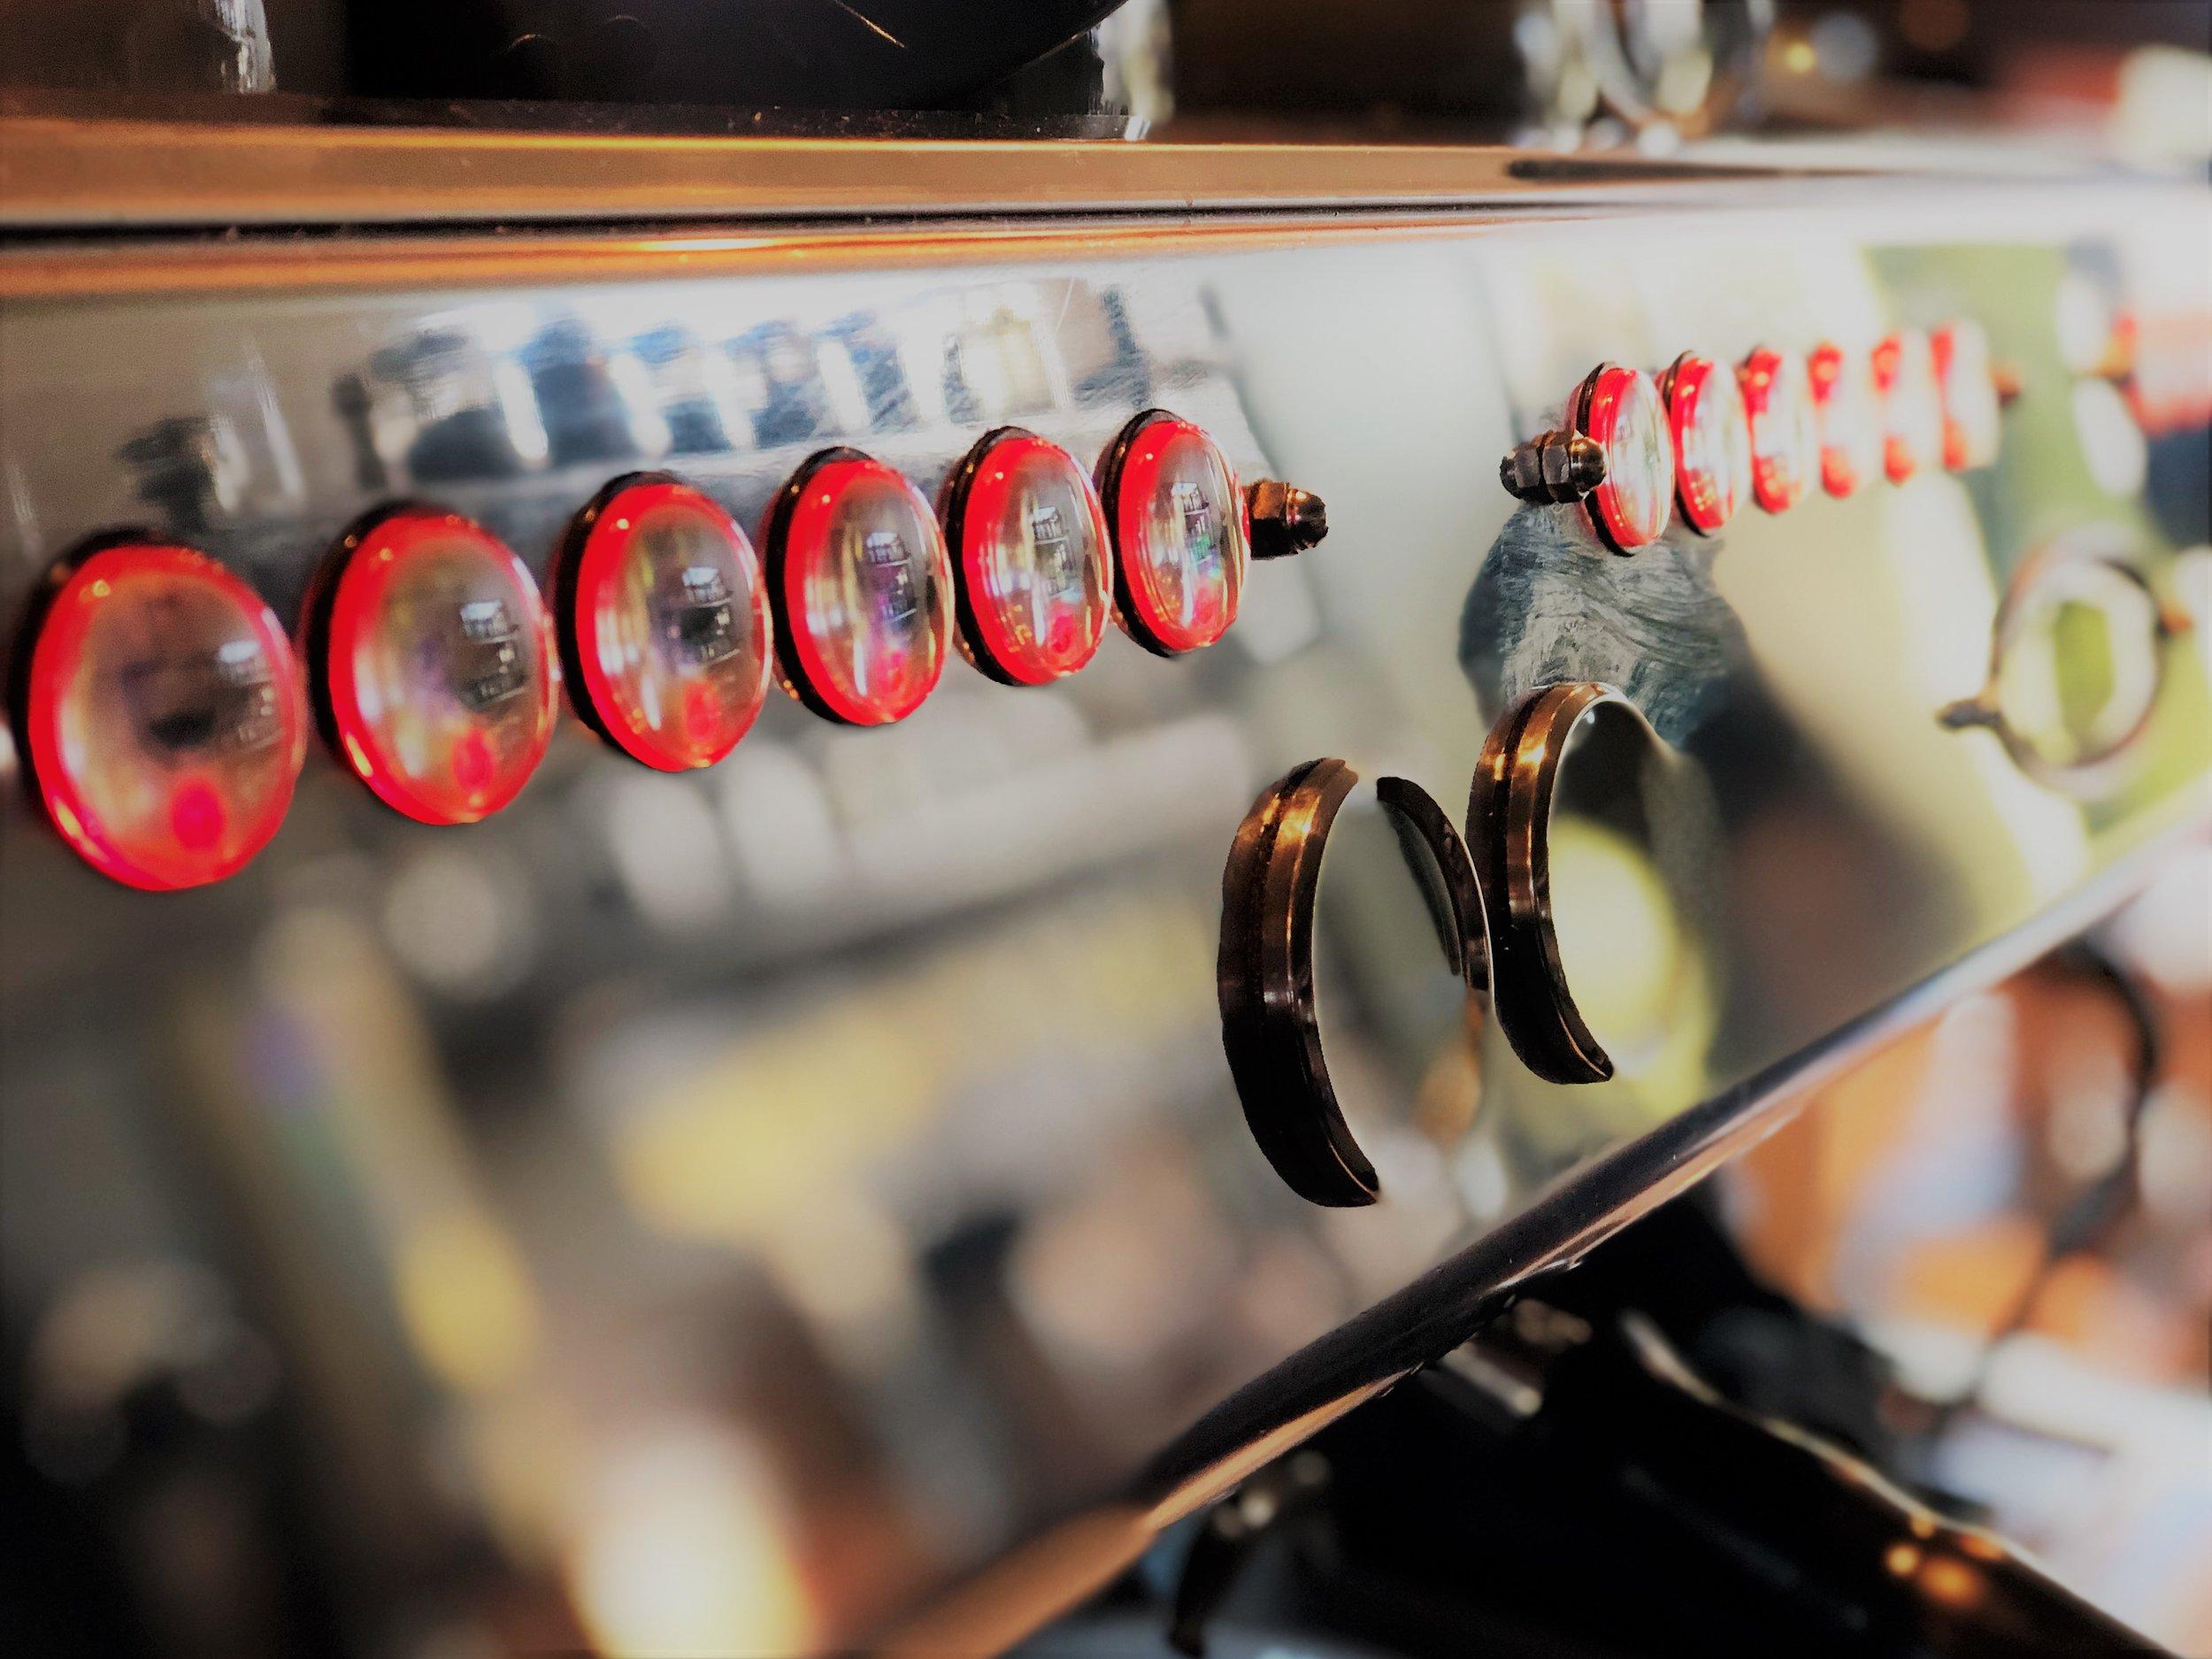 Coffee Machine Detail #1.JPG